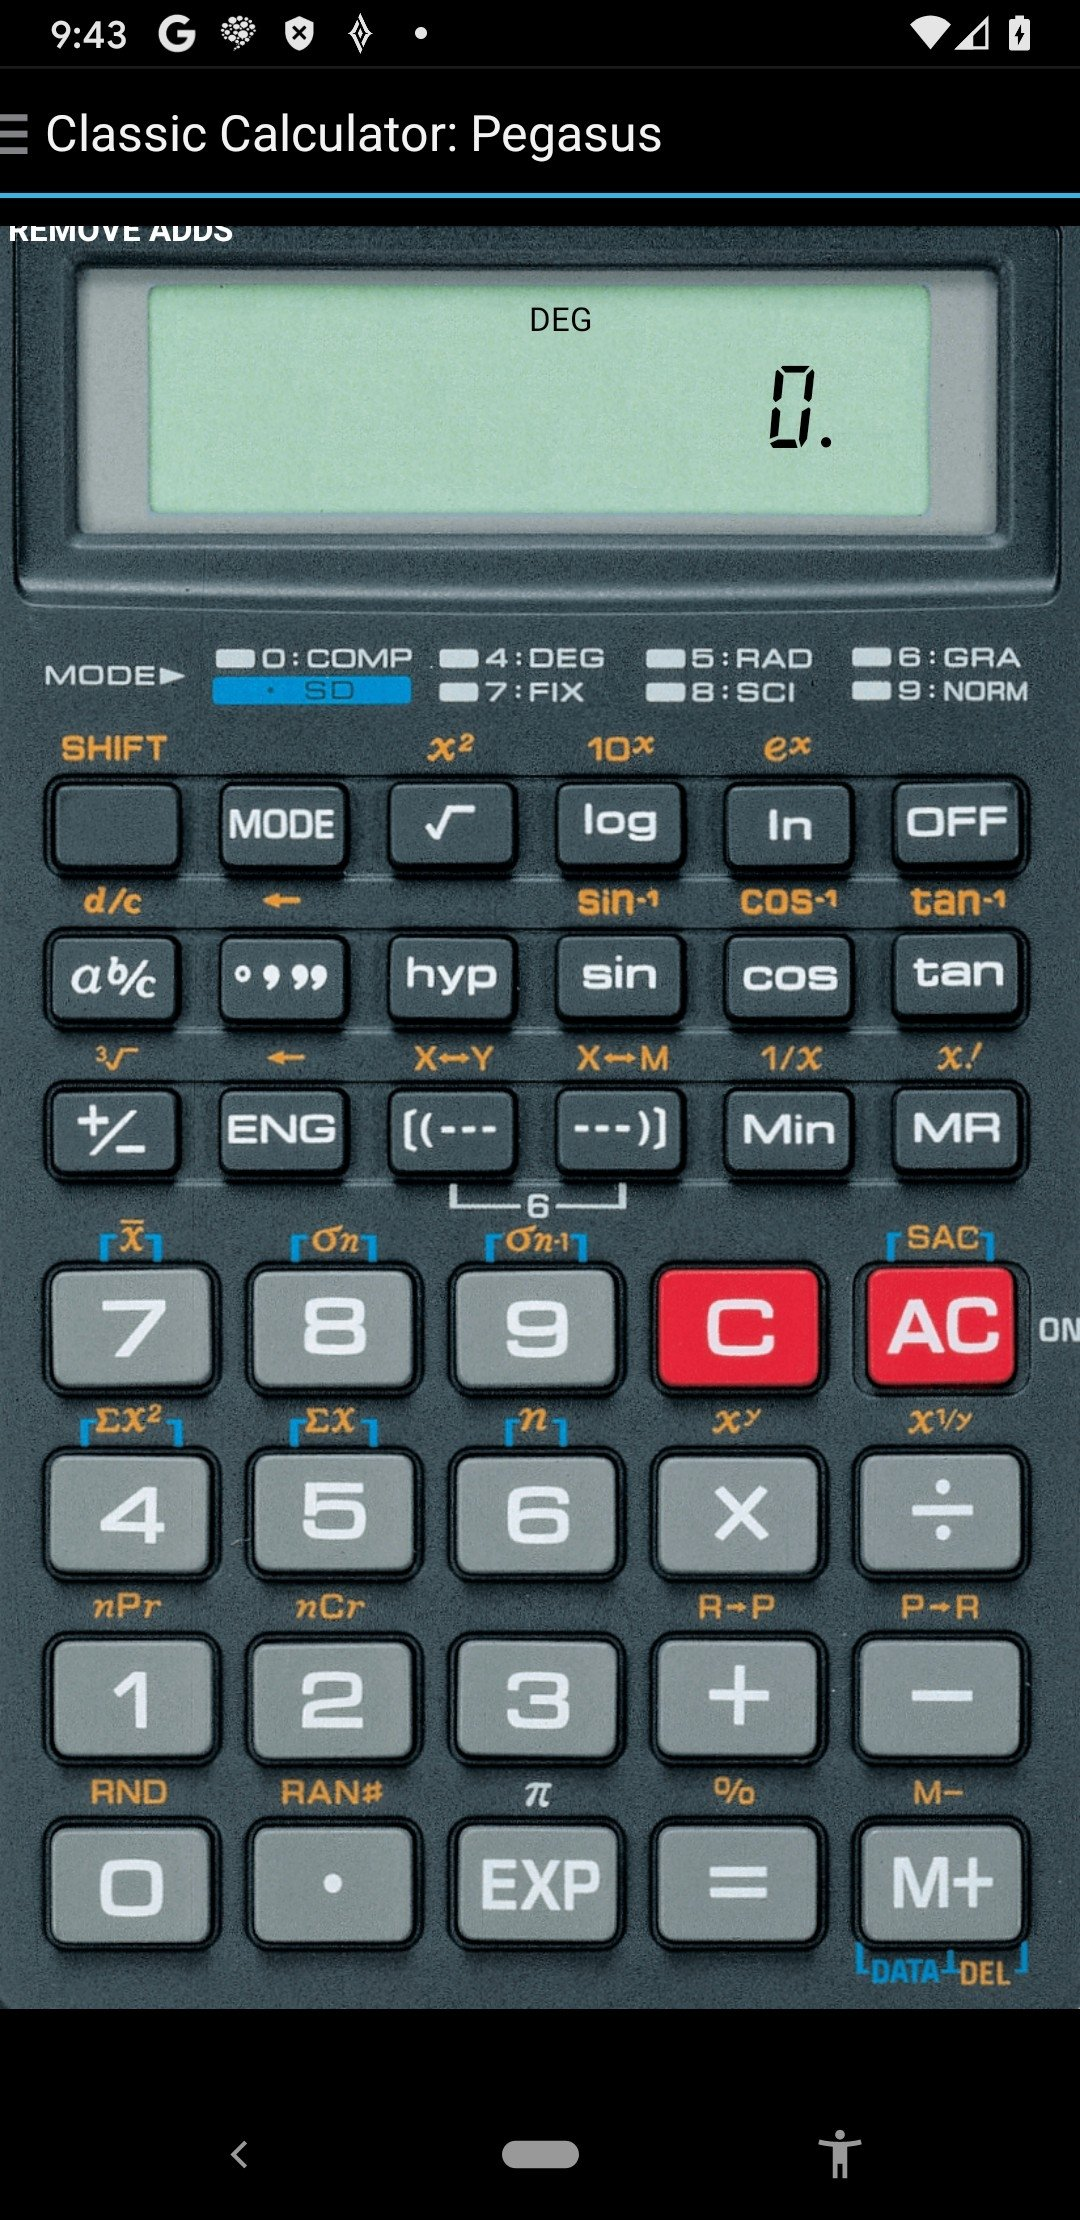 Calculatrice Classique Android image 5